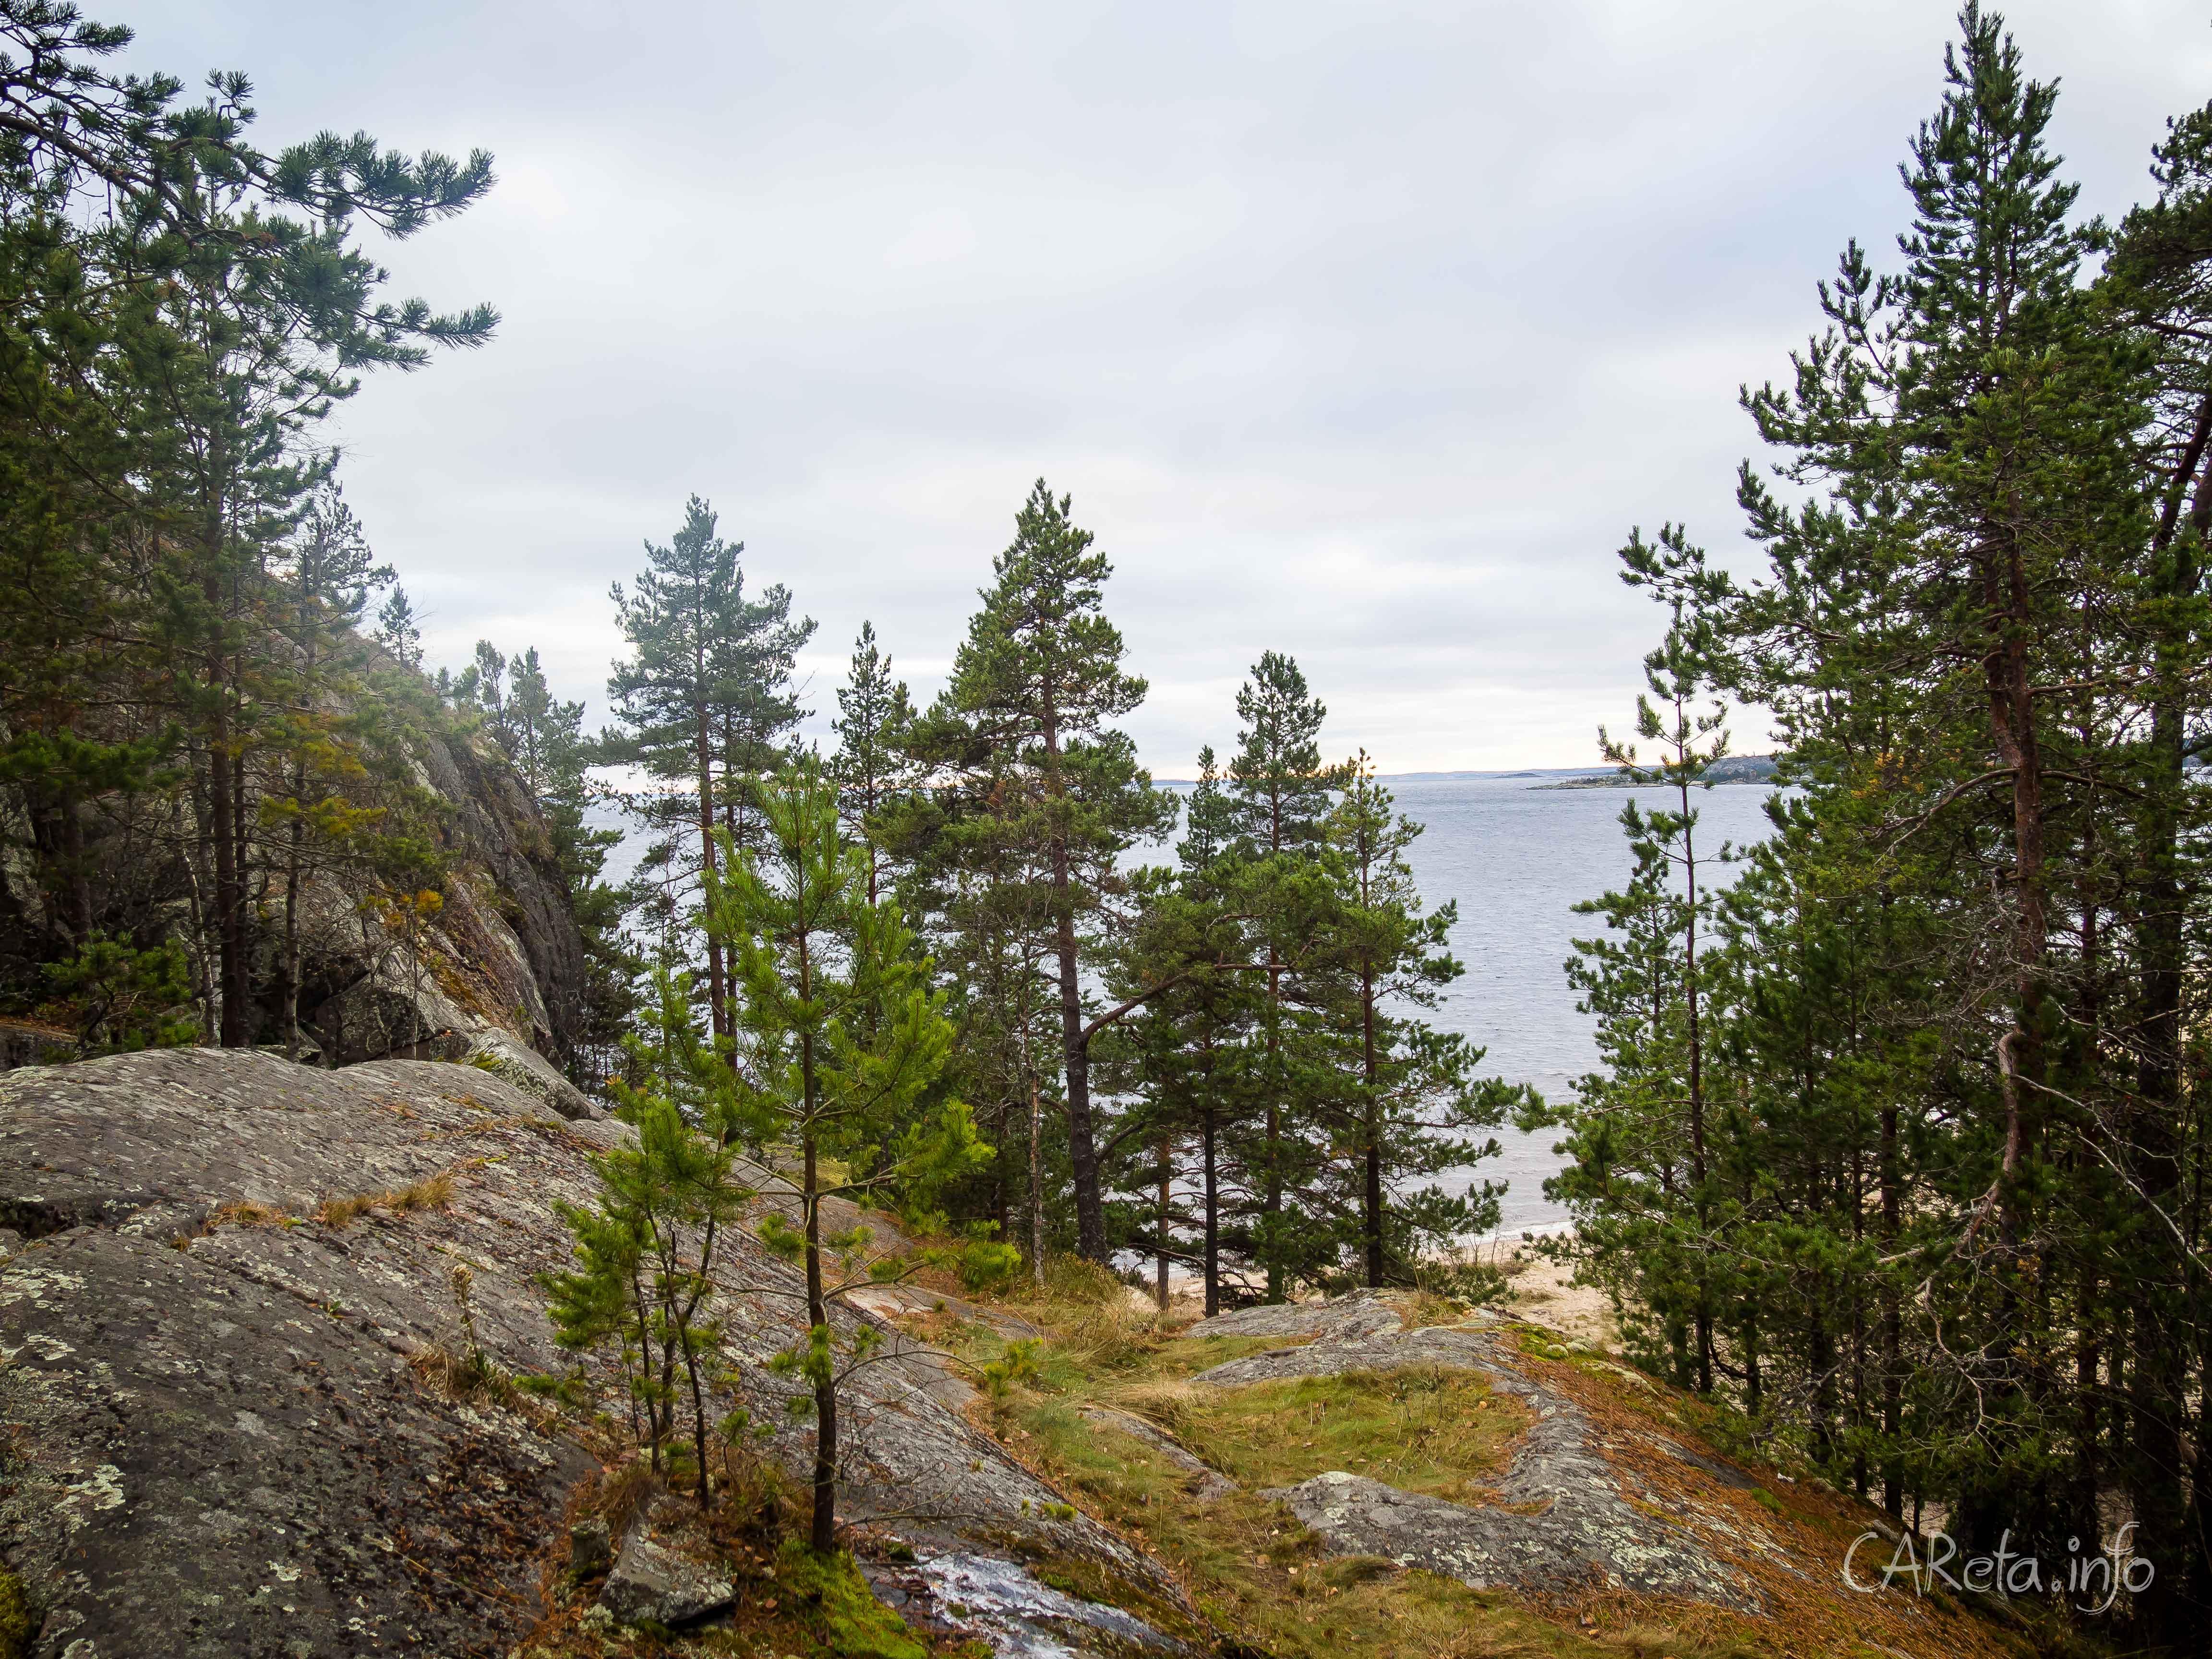 Путешествие в Карелию по медвежьей земле на SKODA Kodiaq